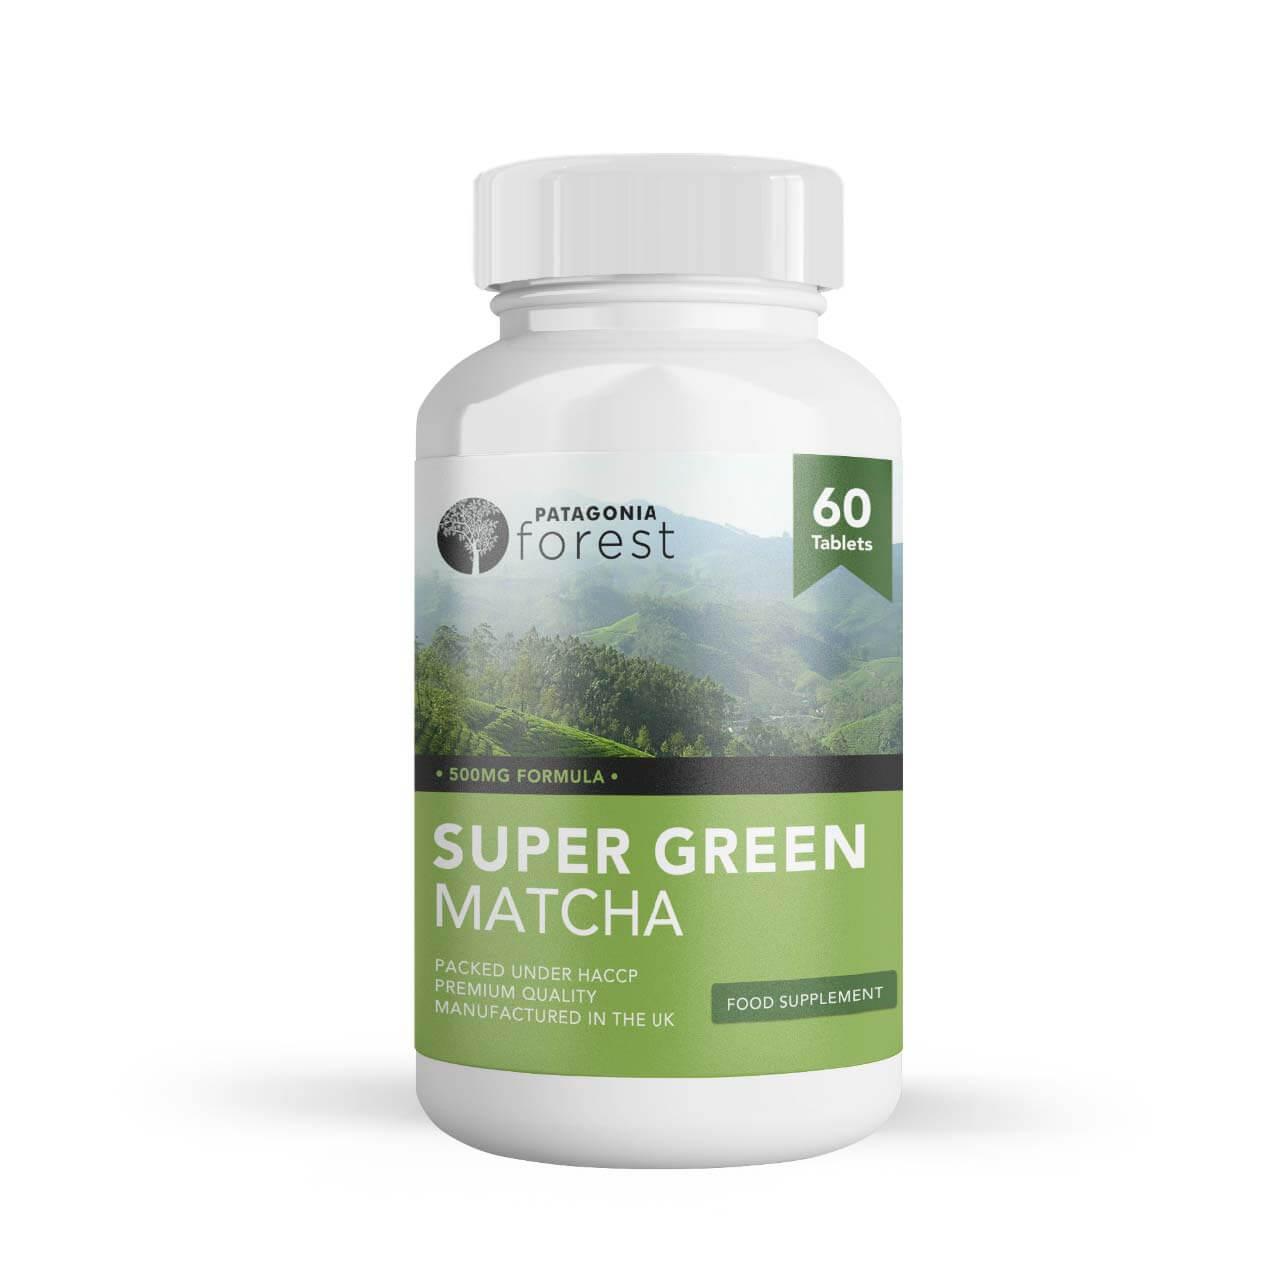 Patagonia Forest: Super Green Matcha - extra jemný zelený čaj (balenie 60 tabliet)